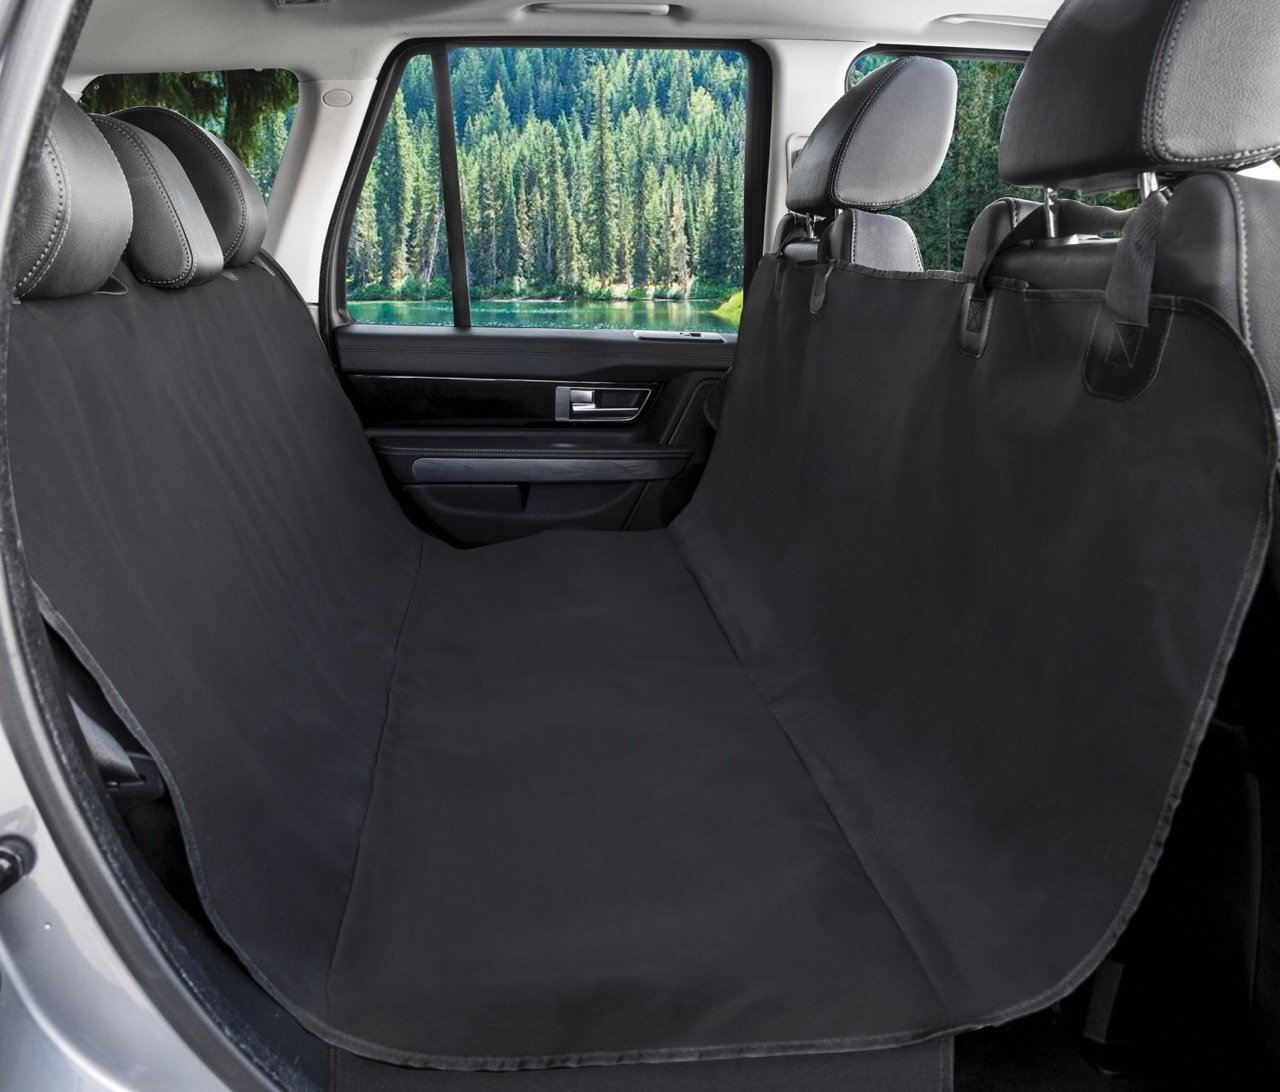 BarksBar Original Pet Seat Cover for Cars - Black, WaterProof & Hammock Convertible (Standard, Black) by BarksBar